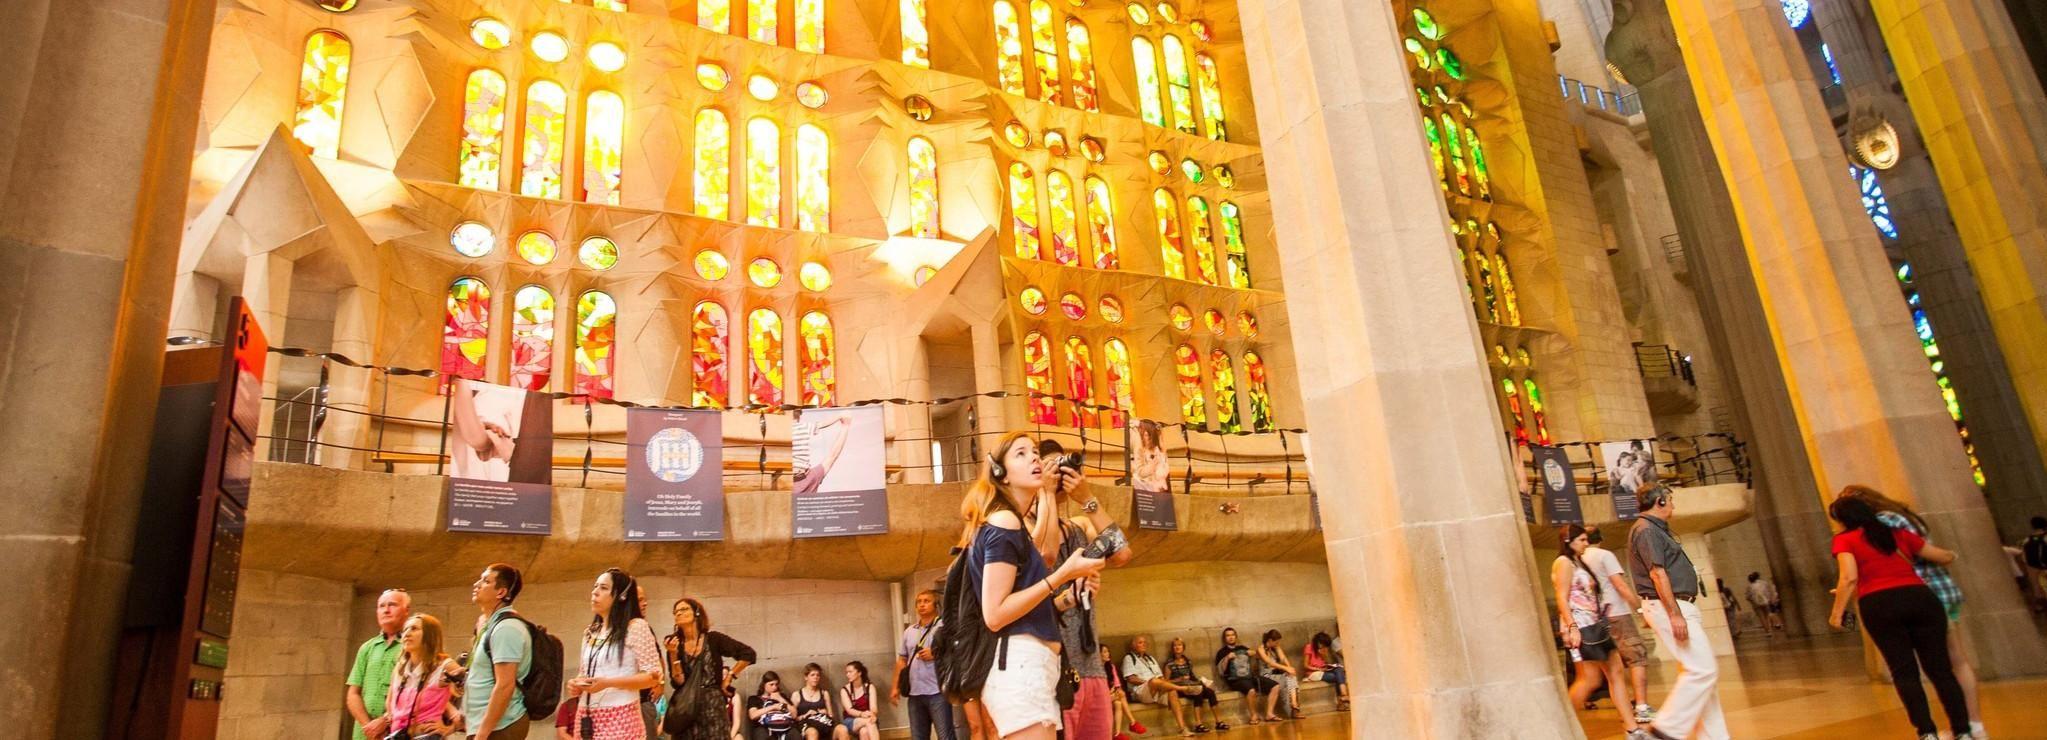 Barcelona Highlights Tour - Sagrada Familia & Poble Espanyol